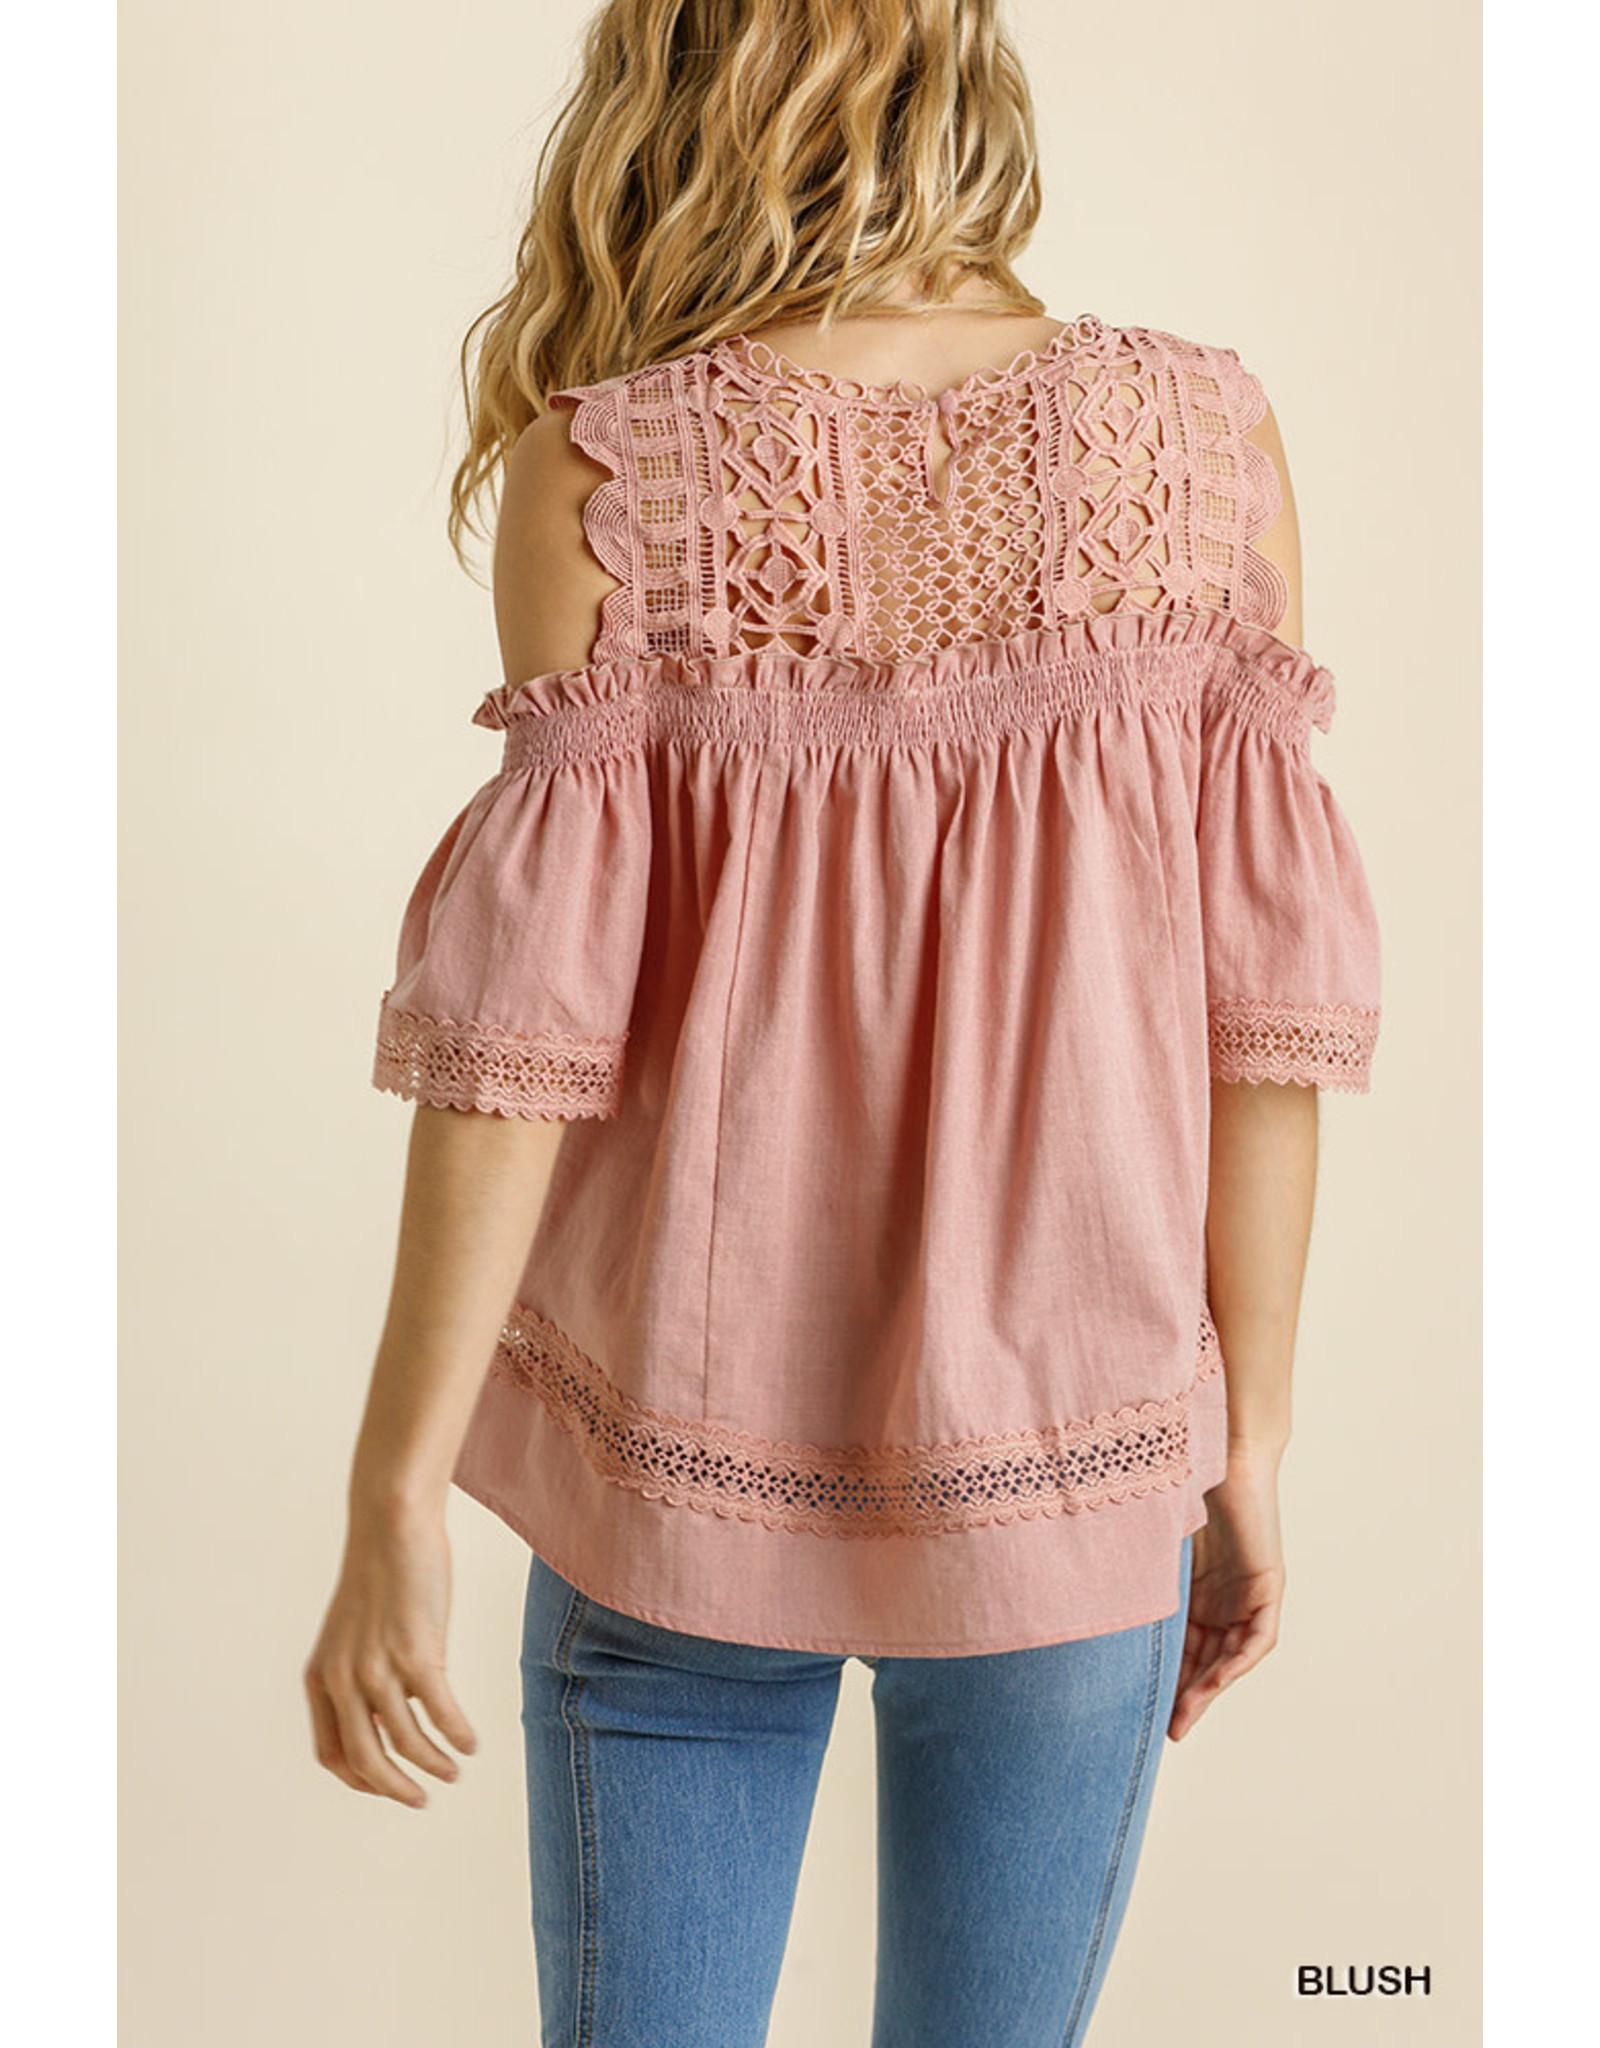 Umgee USA Blush Crochet Lace Cold Shoulder S/S Top